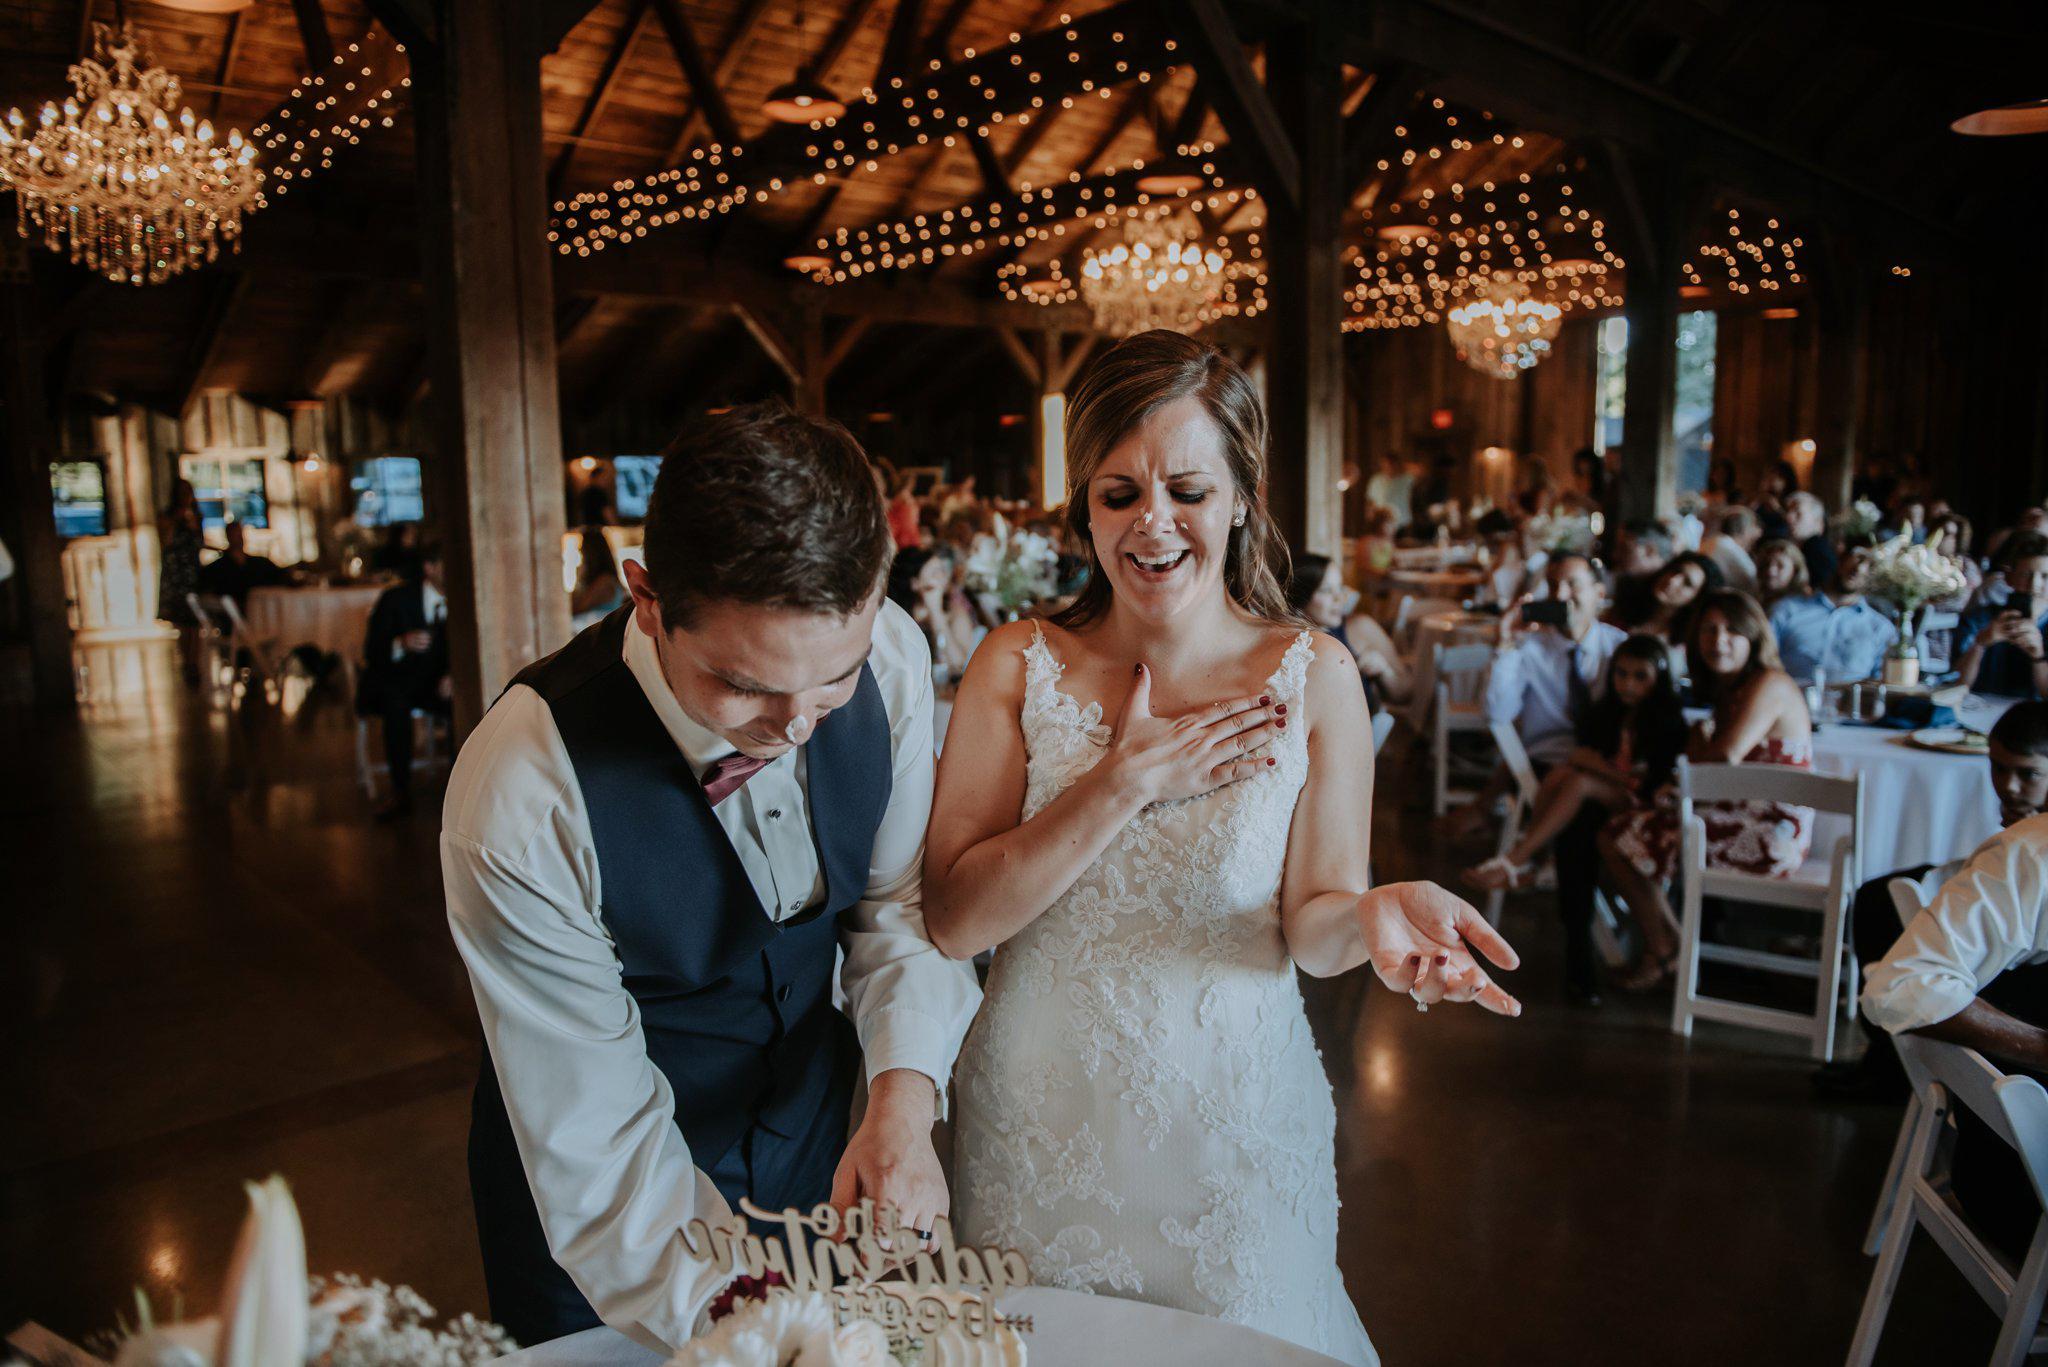 kristen-and-cody-the-kelley-farm-wedding-seattle-photographer-caitlyn-nikula-86.jpg